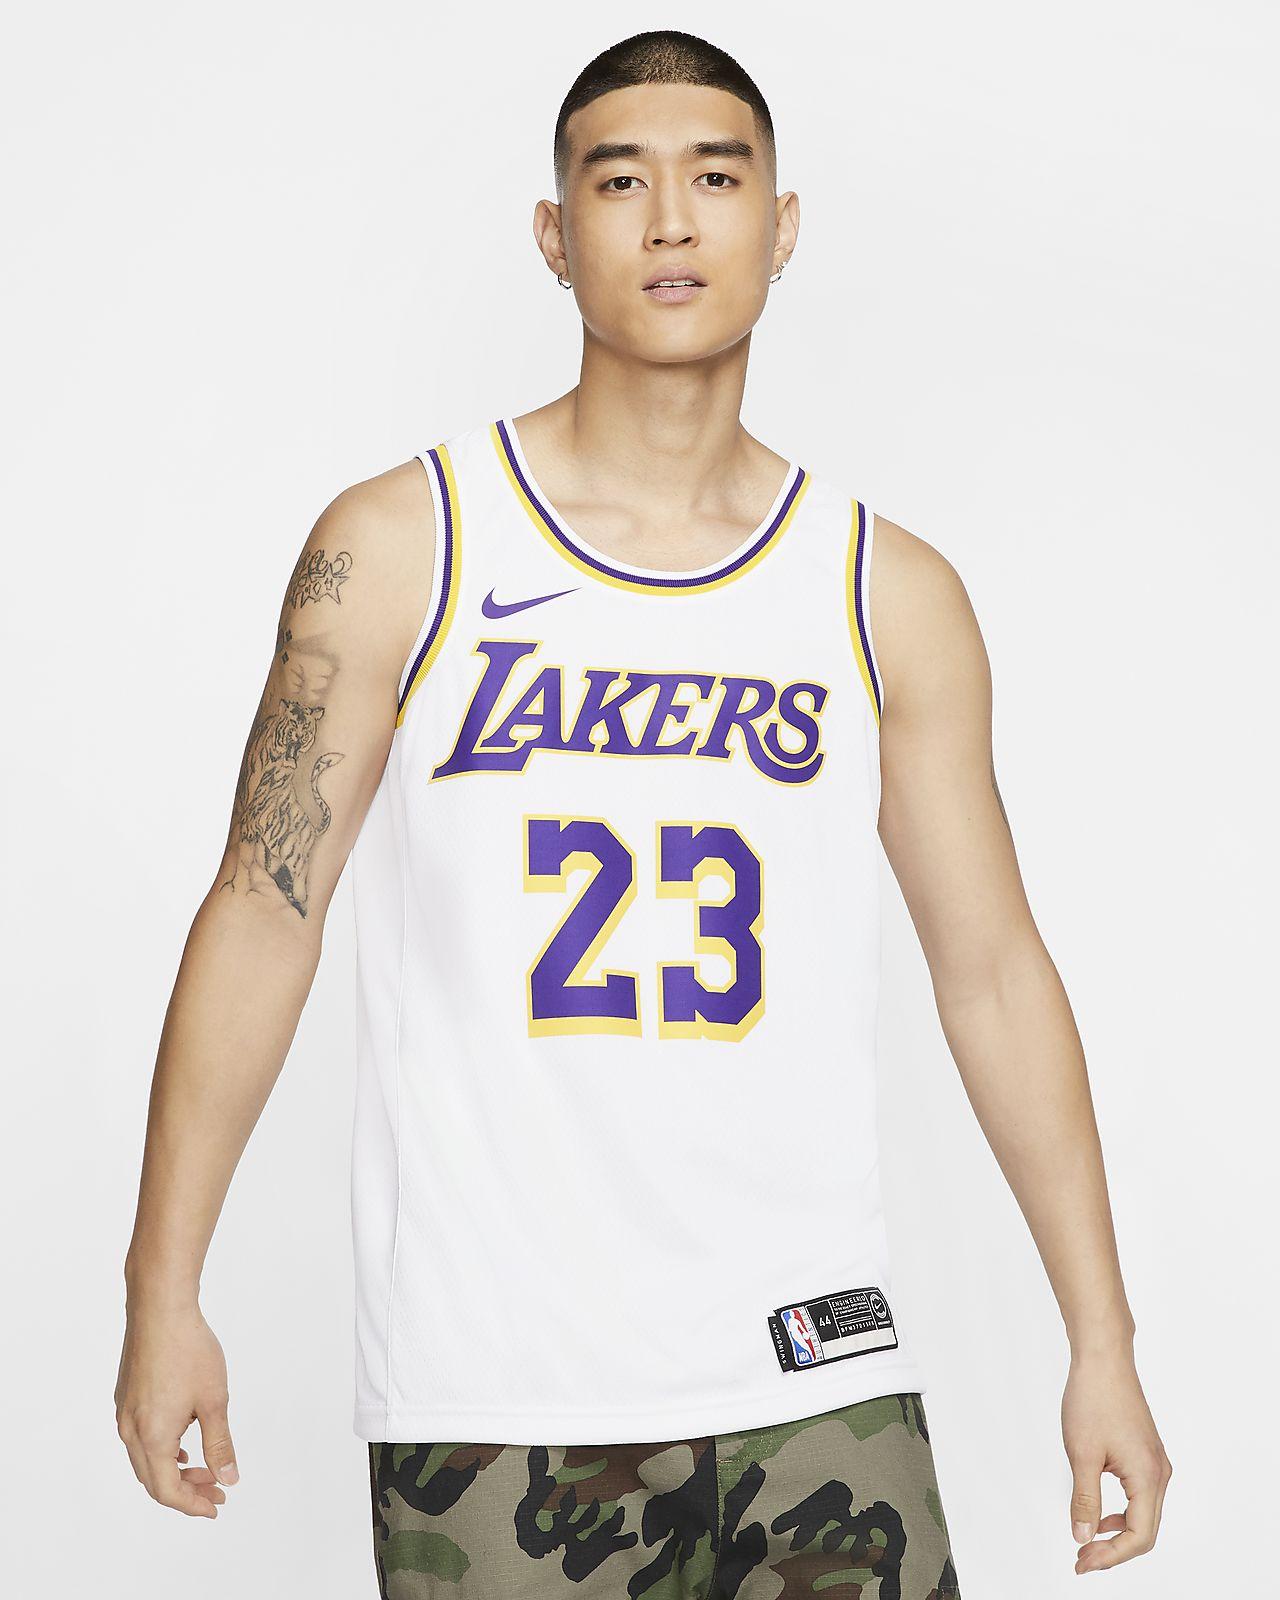 洛杉矶湖人队 (LeBron James) Association Edition Swingman Jersey Nike NBA Connected Jersey 男子球衣